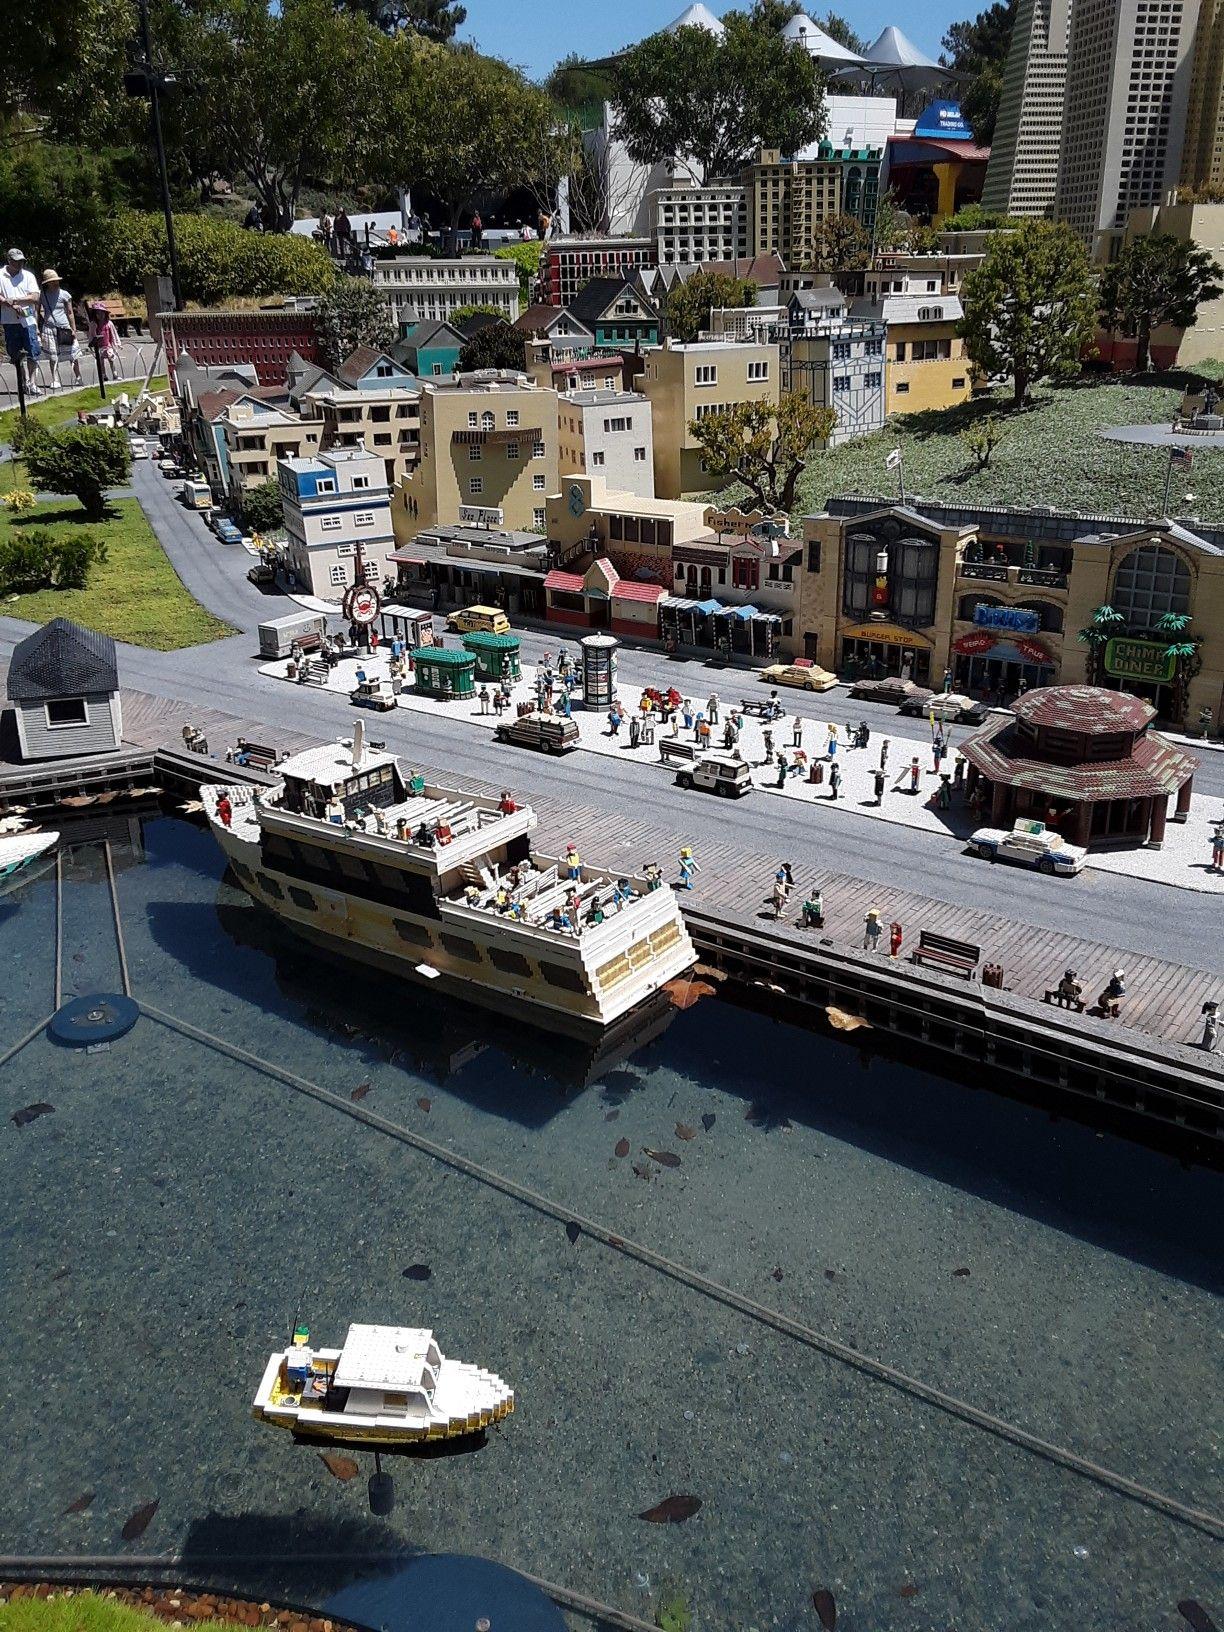 Miniland USA at LEGOLAND photo taken by SanLuisObispoMom ...